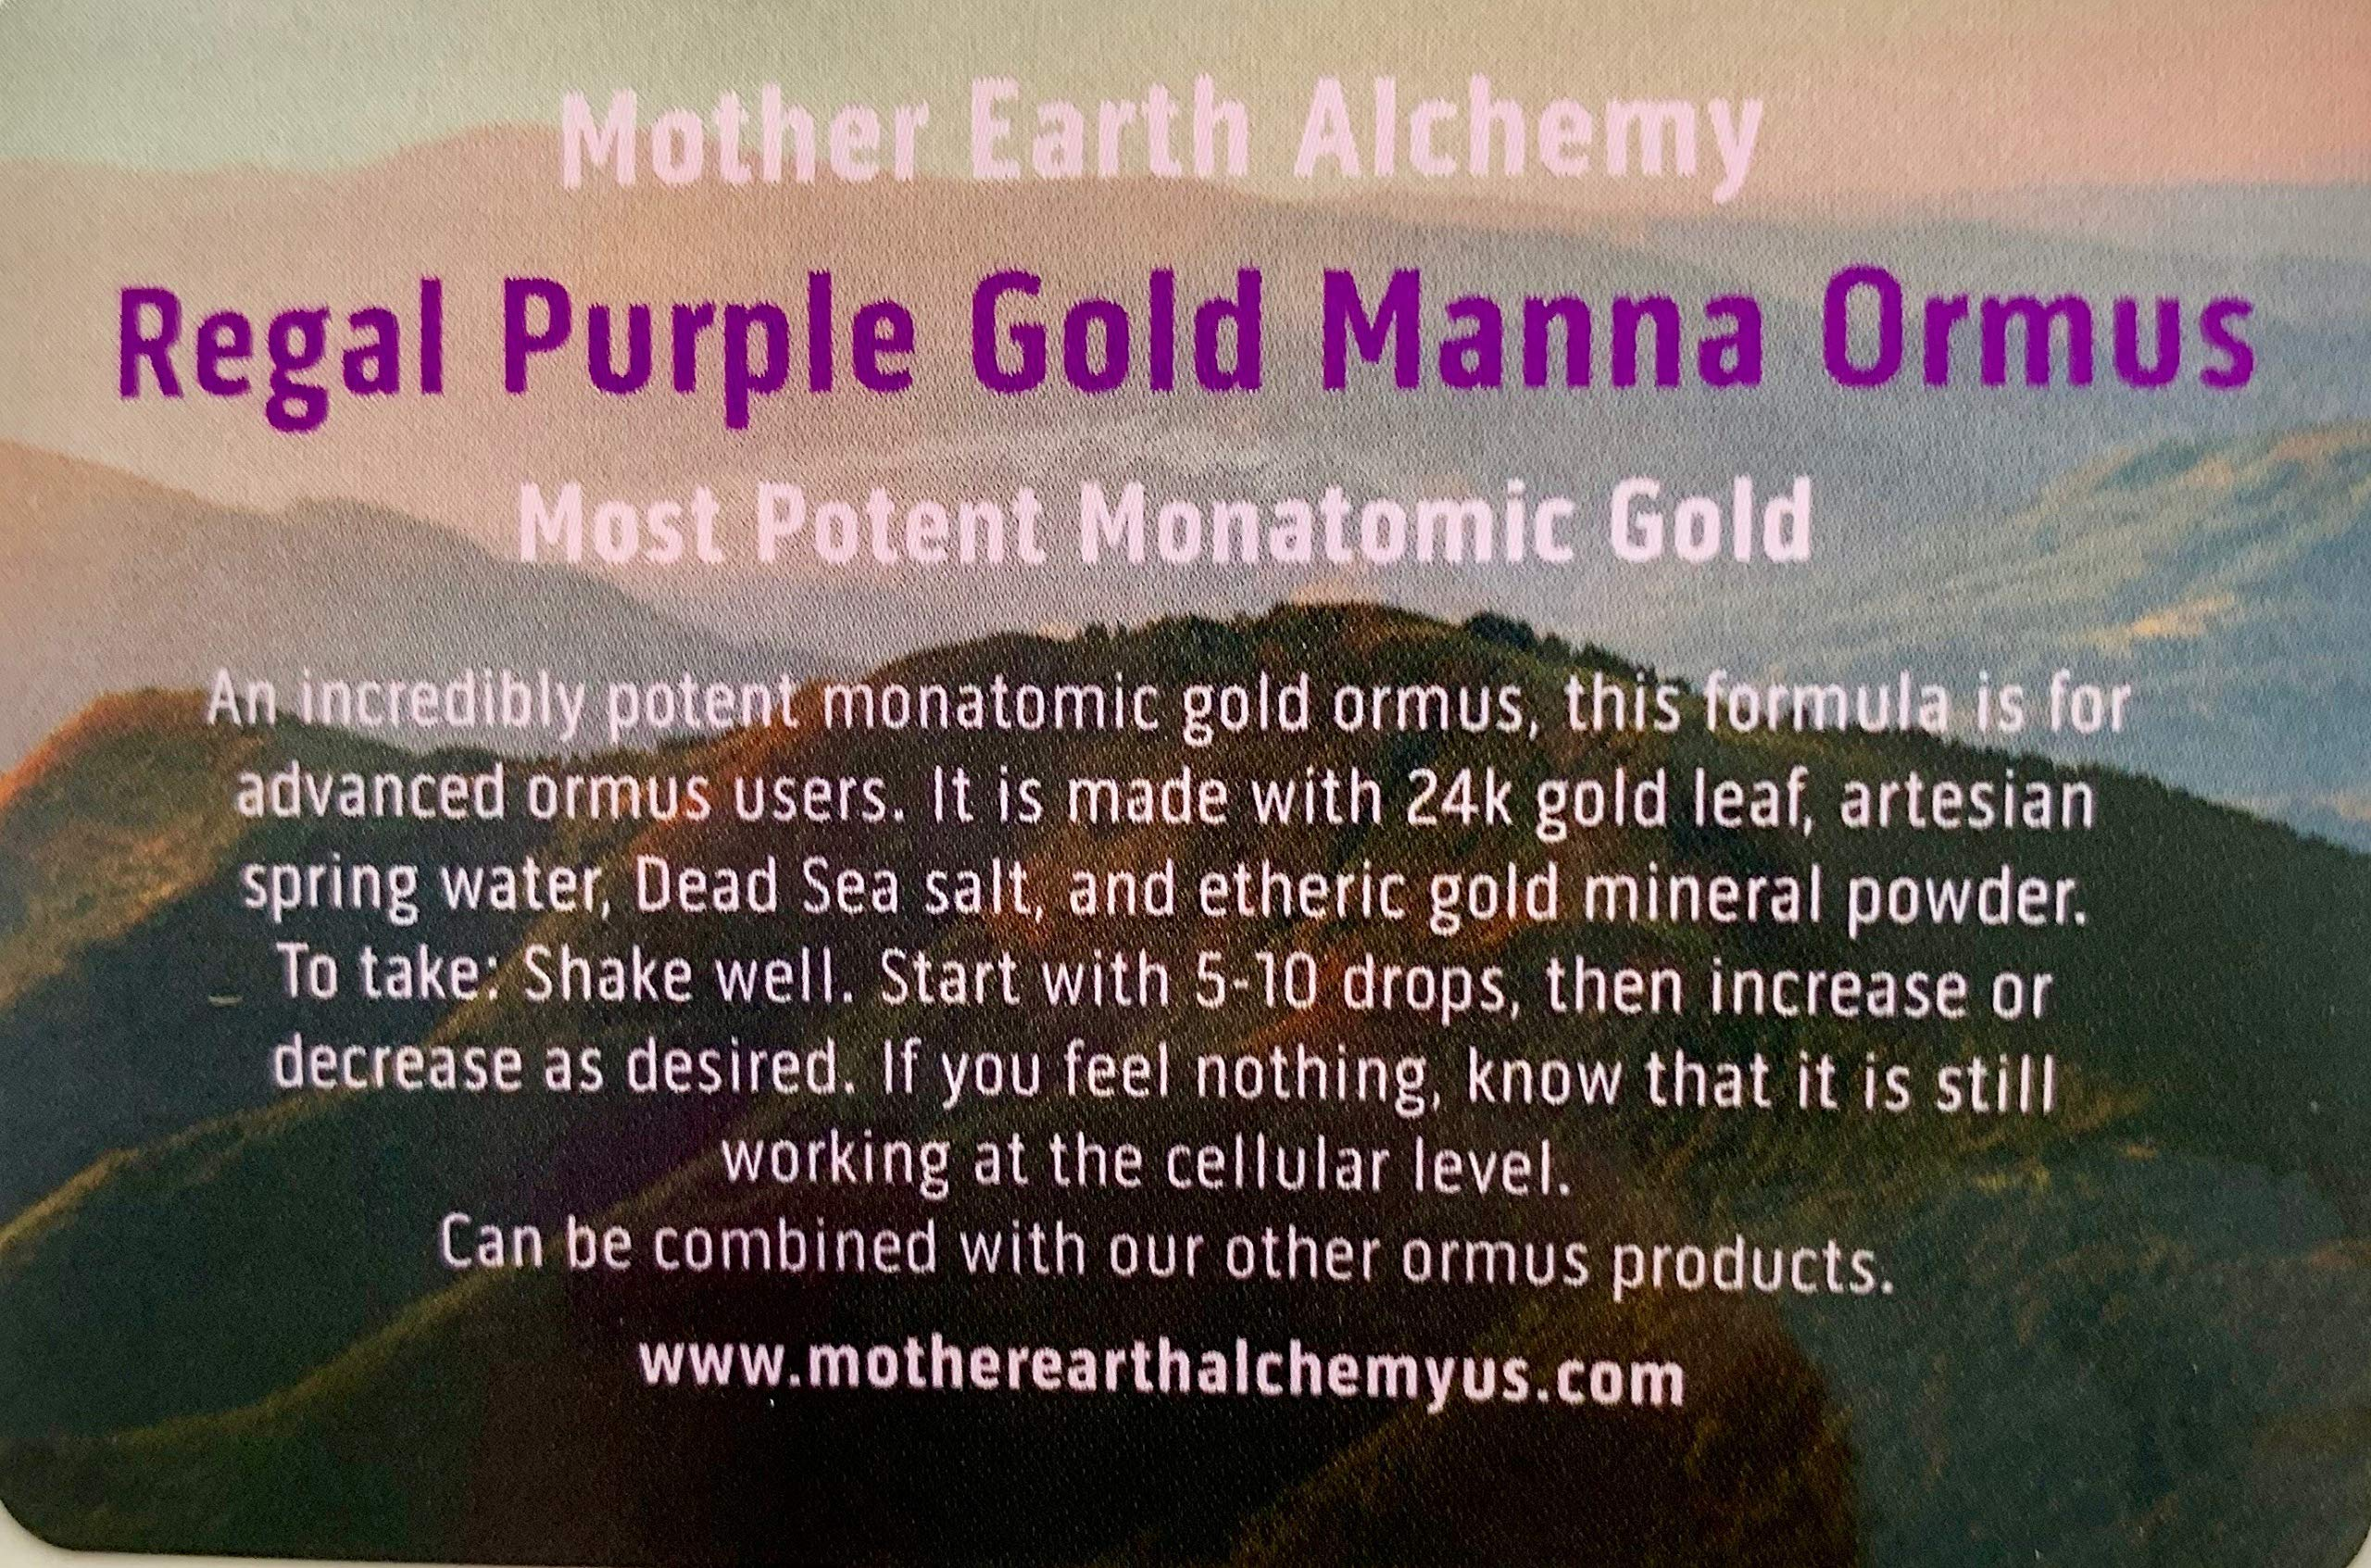 Regal Purple Gold Manna Ormus - 1oz - Mother Earth Alchemy